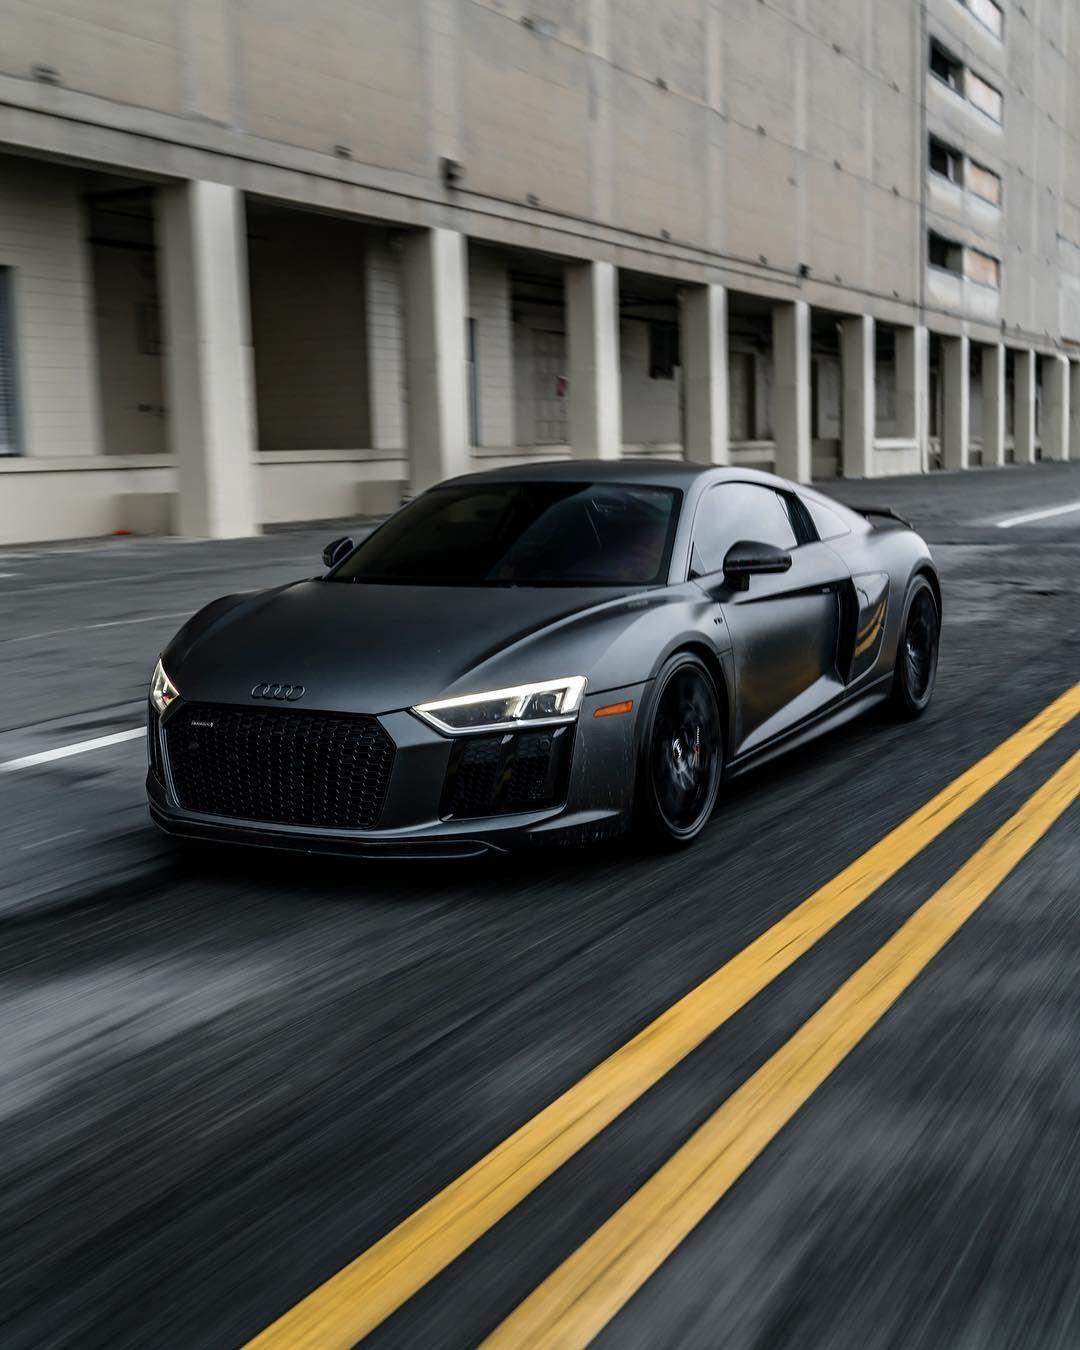 Sports Cars Luxury, Audi Cars, Audi R8